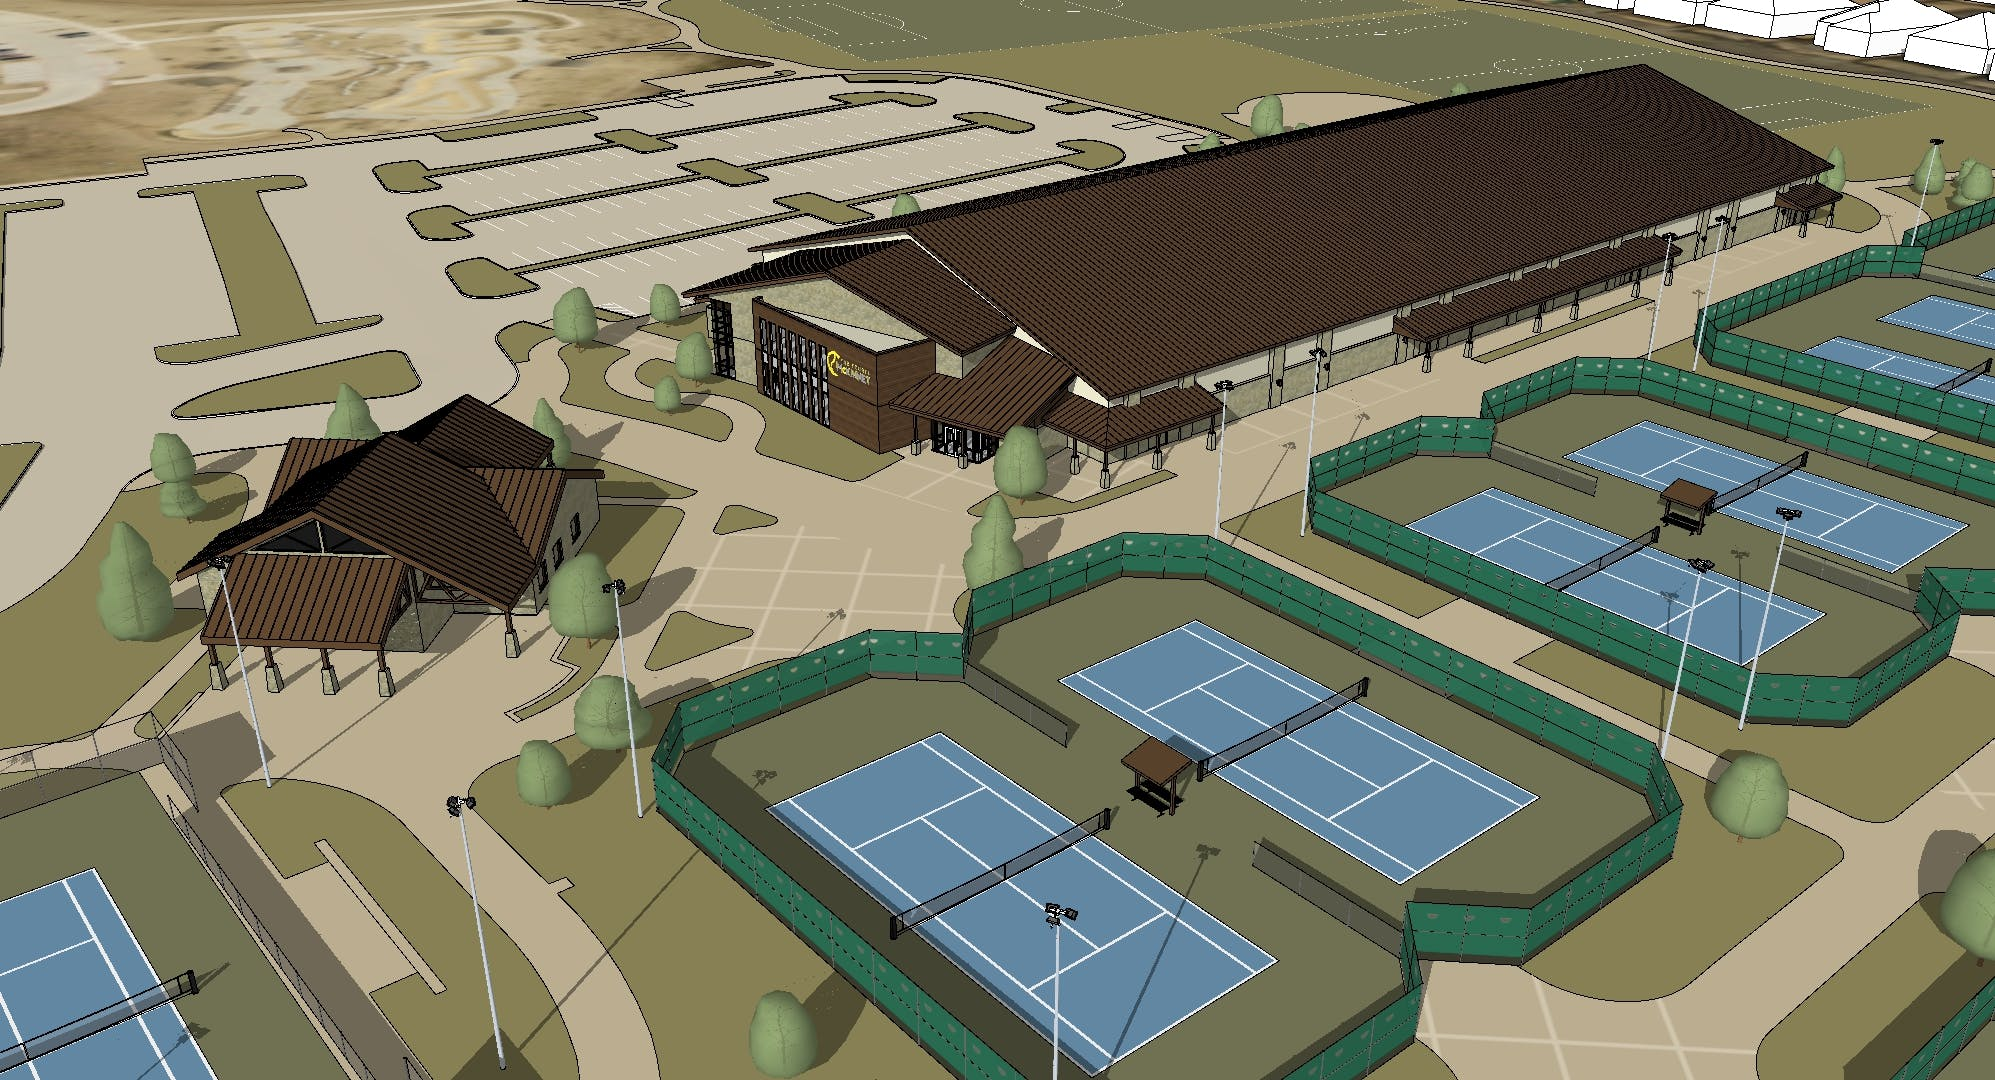 Gabe Nesbitt Indoor Tennis Center Gallery Images